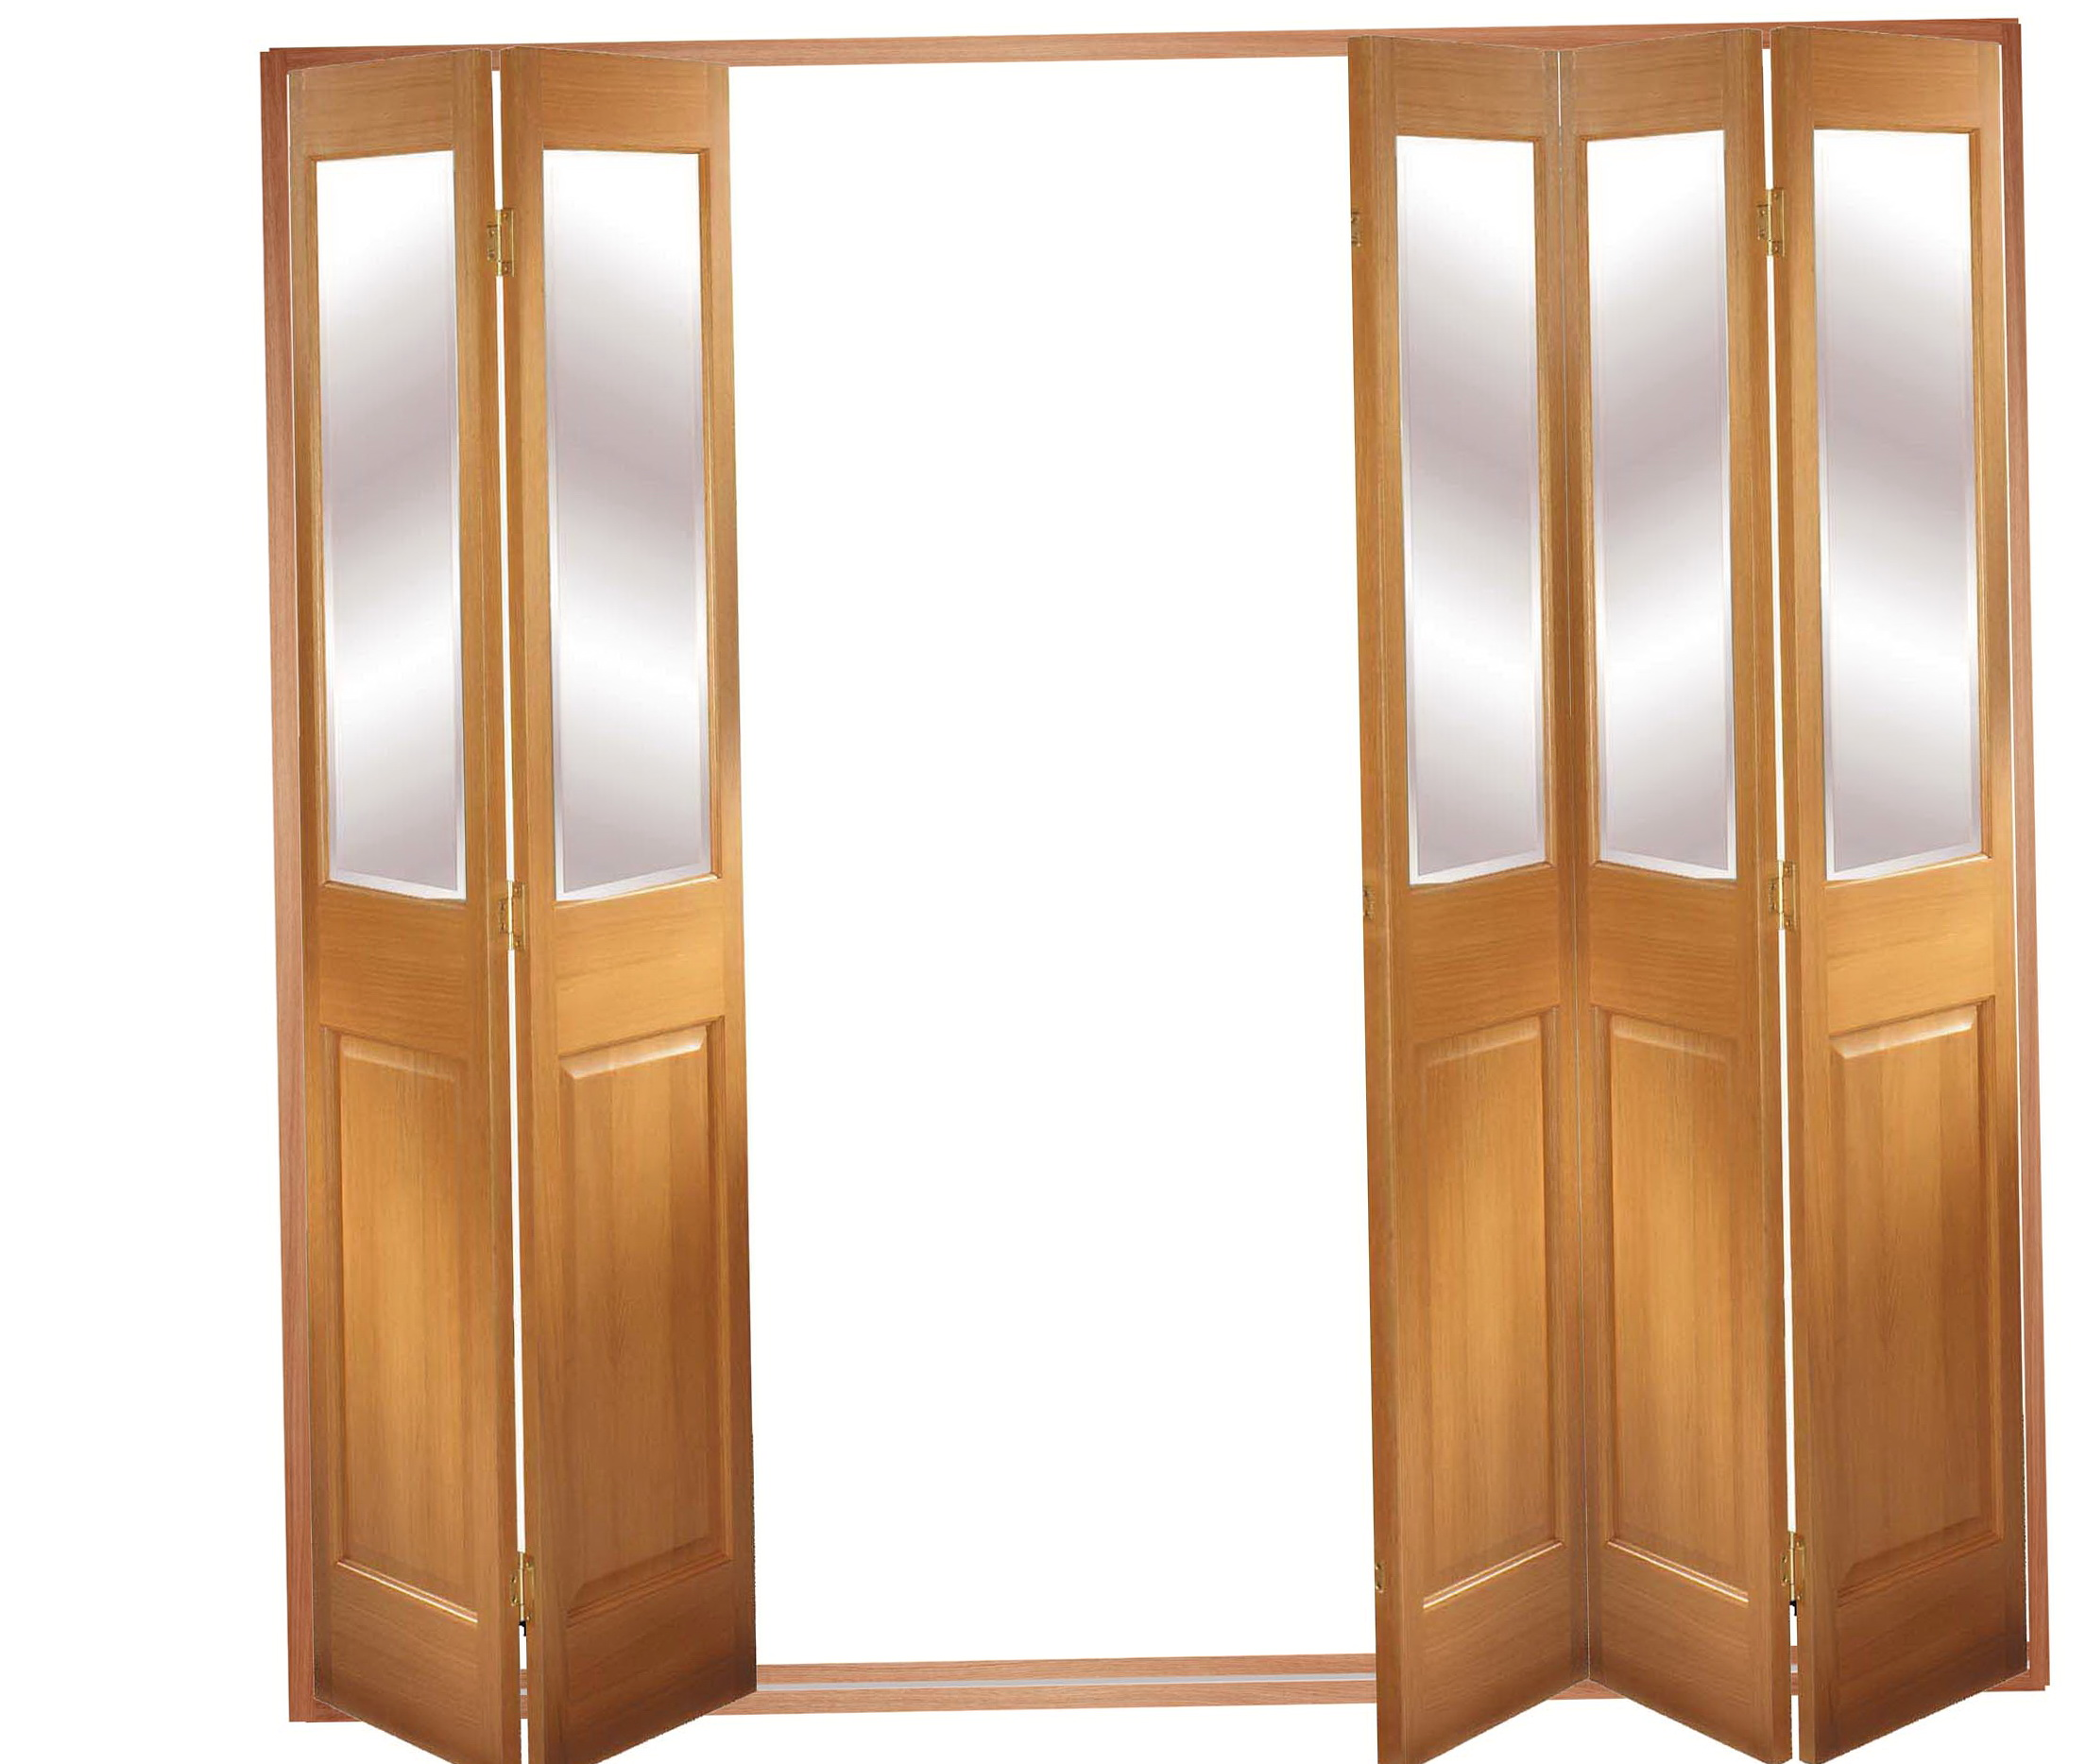 Sliding folding closet doors home design ideas for Folding sliding doors